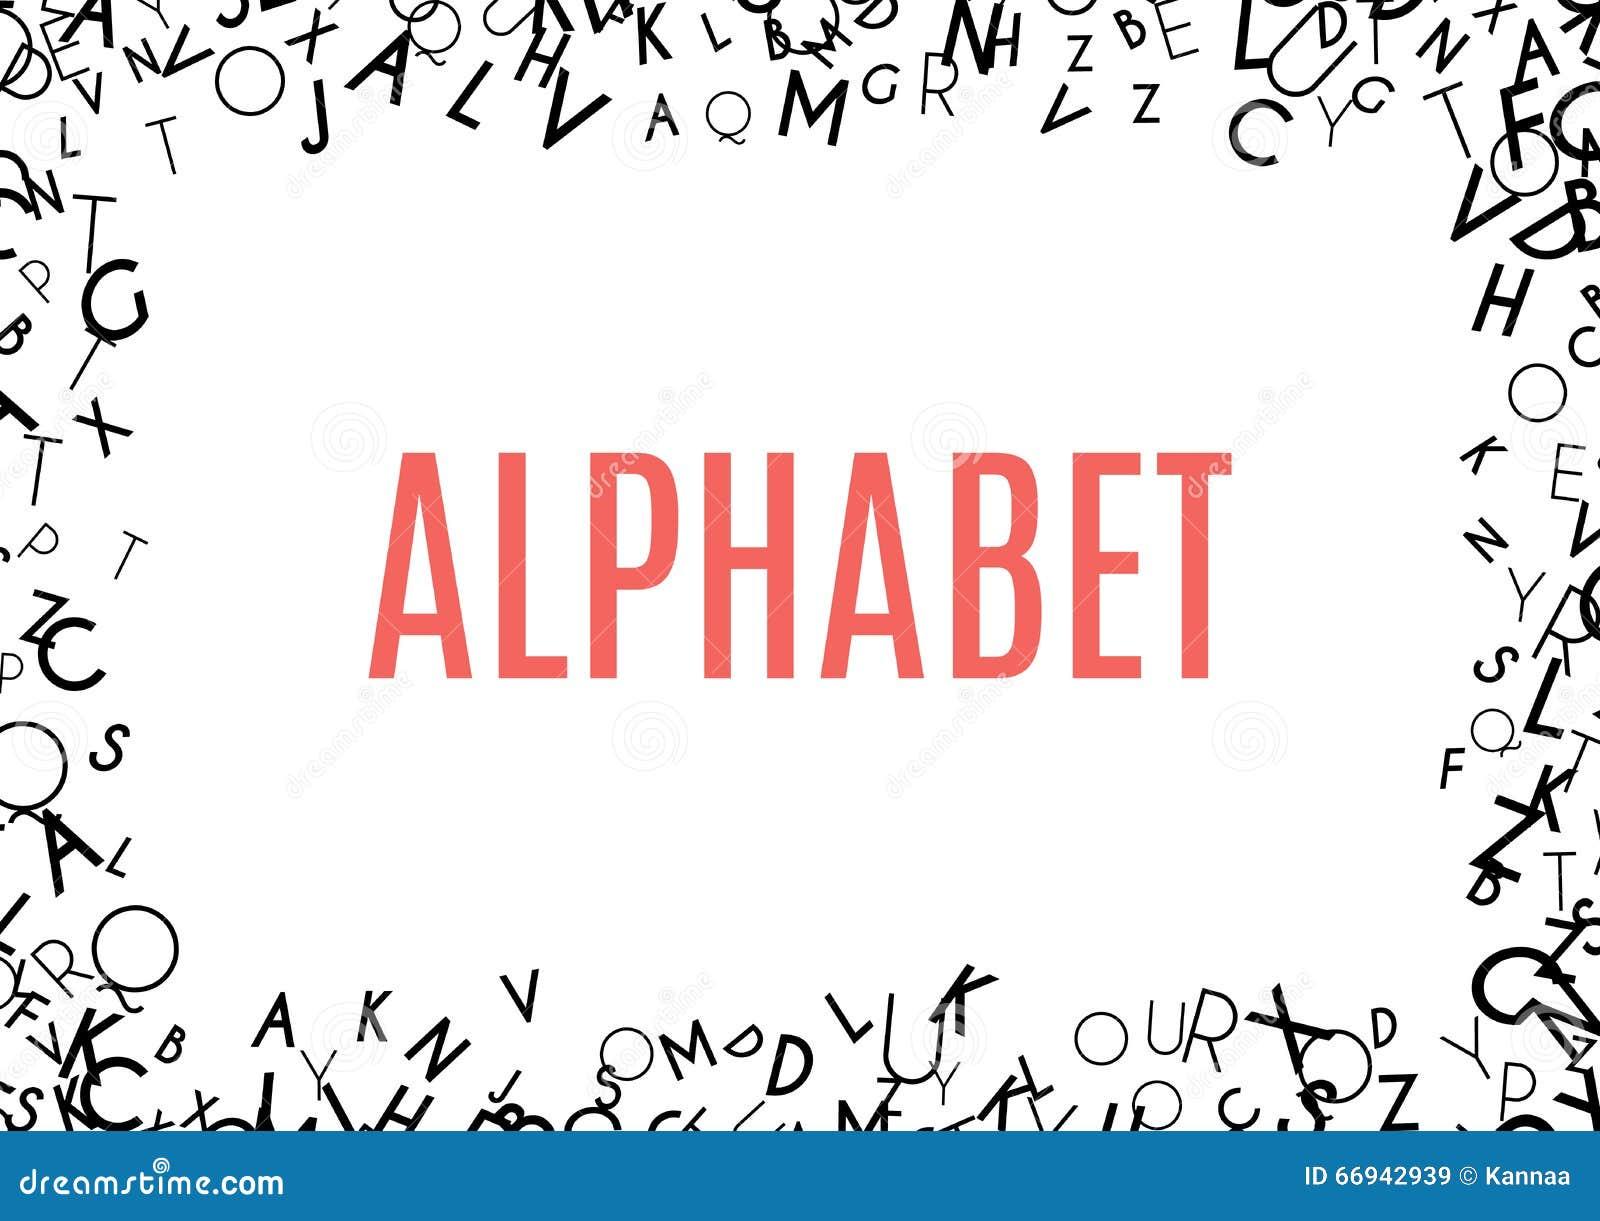 Abstract Black Alphabet Ornament Frame On White Background Stock ...